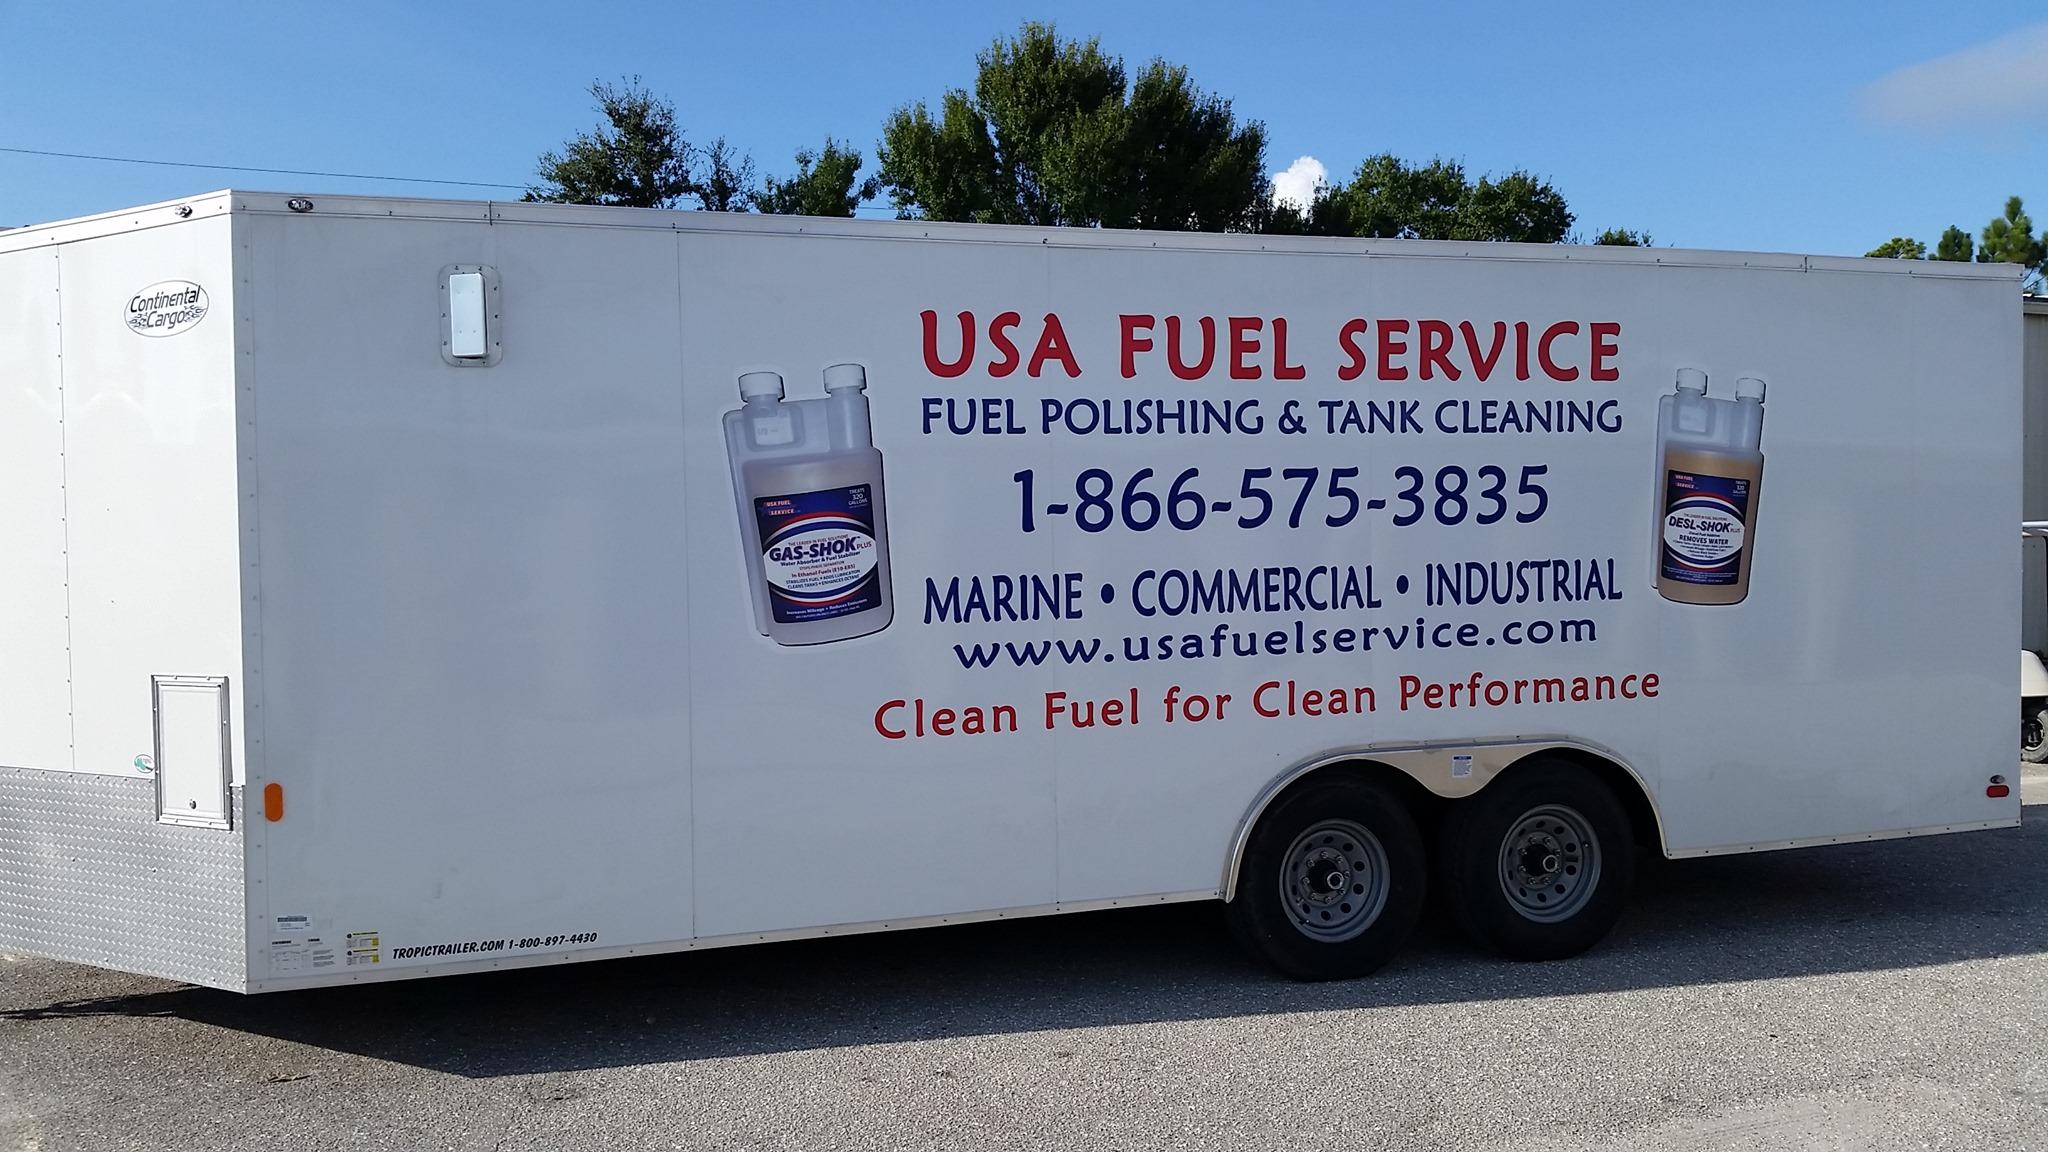 USA Fuel Service Trailer